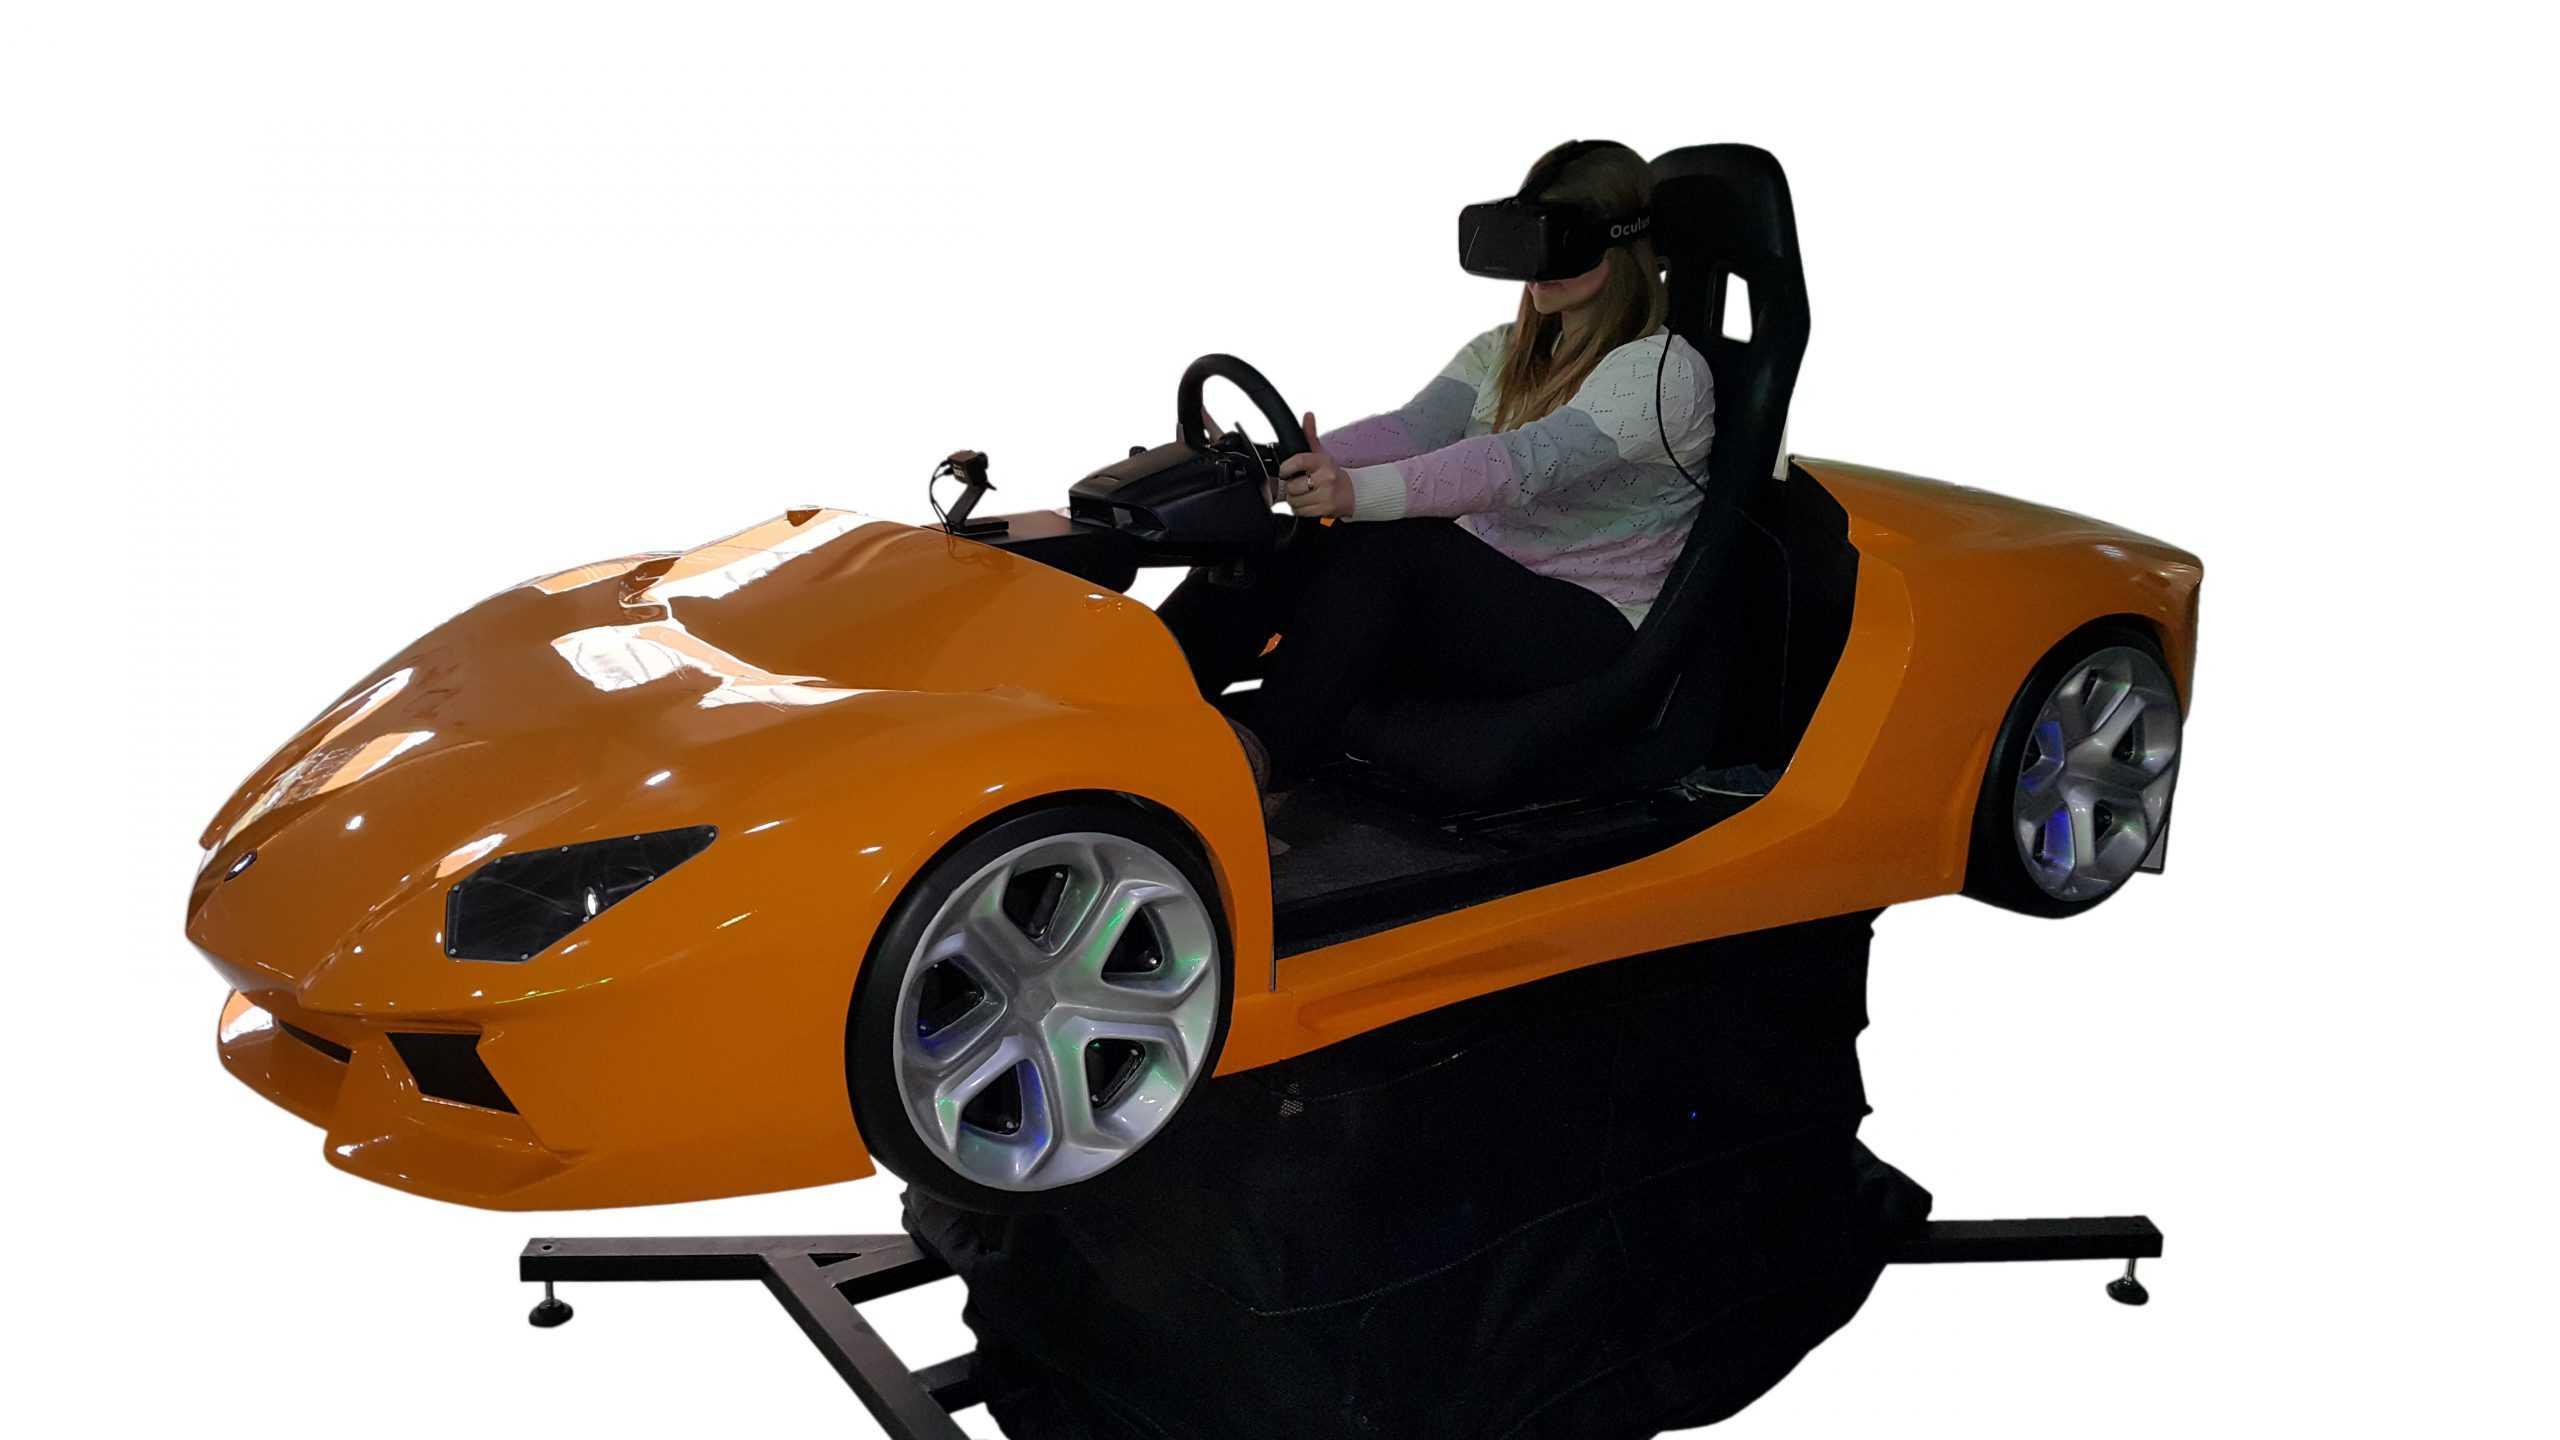 Full motion racing simulator 2dof, 3dof,4dof,6dof motion platform